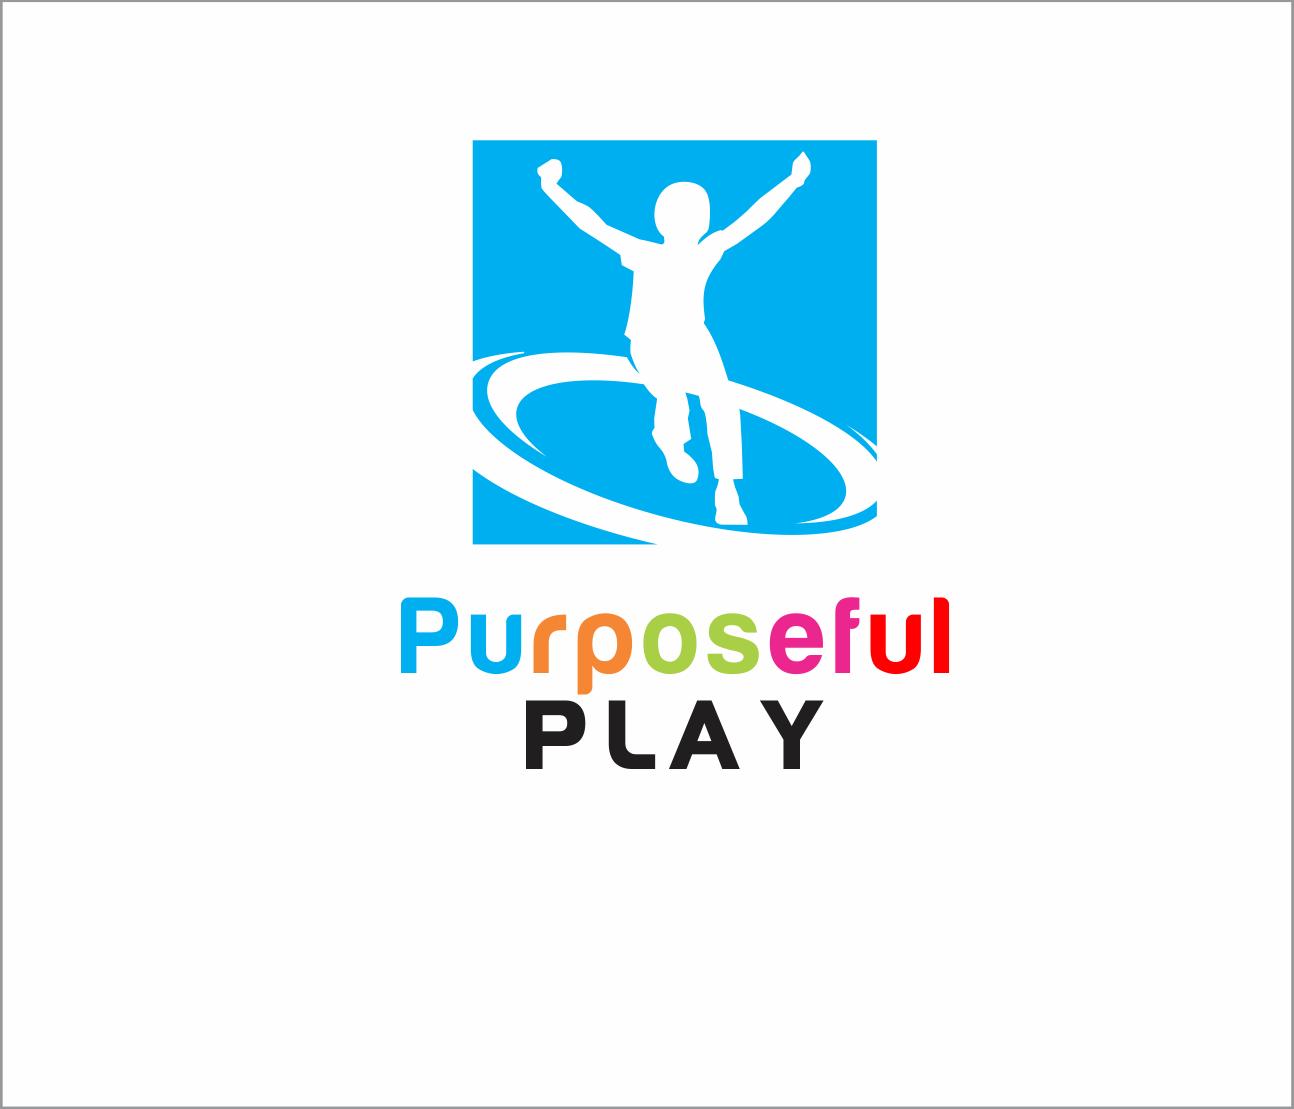 Logo Design by Armada Jamaluddin - Entry No. 27 in the Logo Design Contest Purposeful PLAY Logo Design.